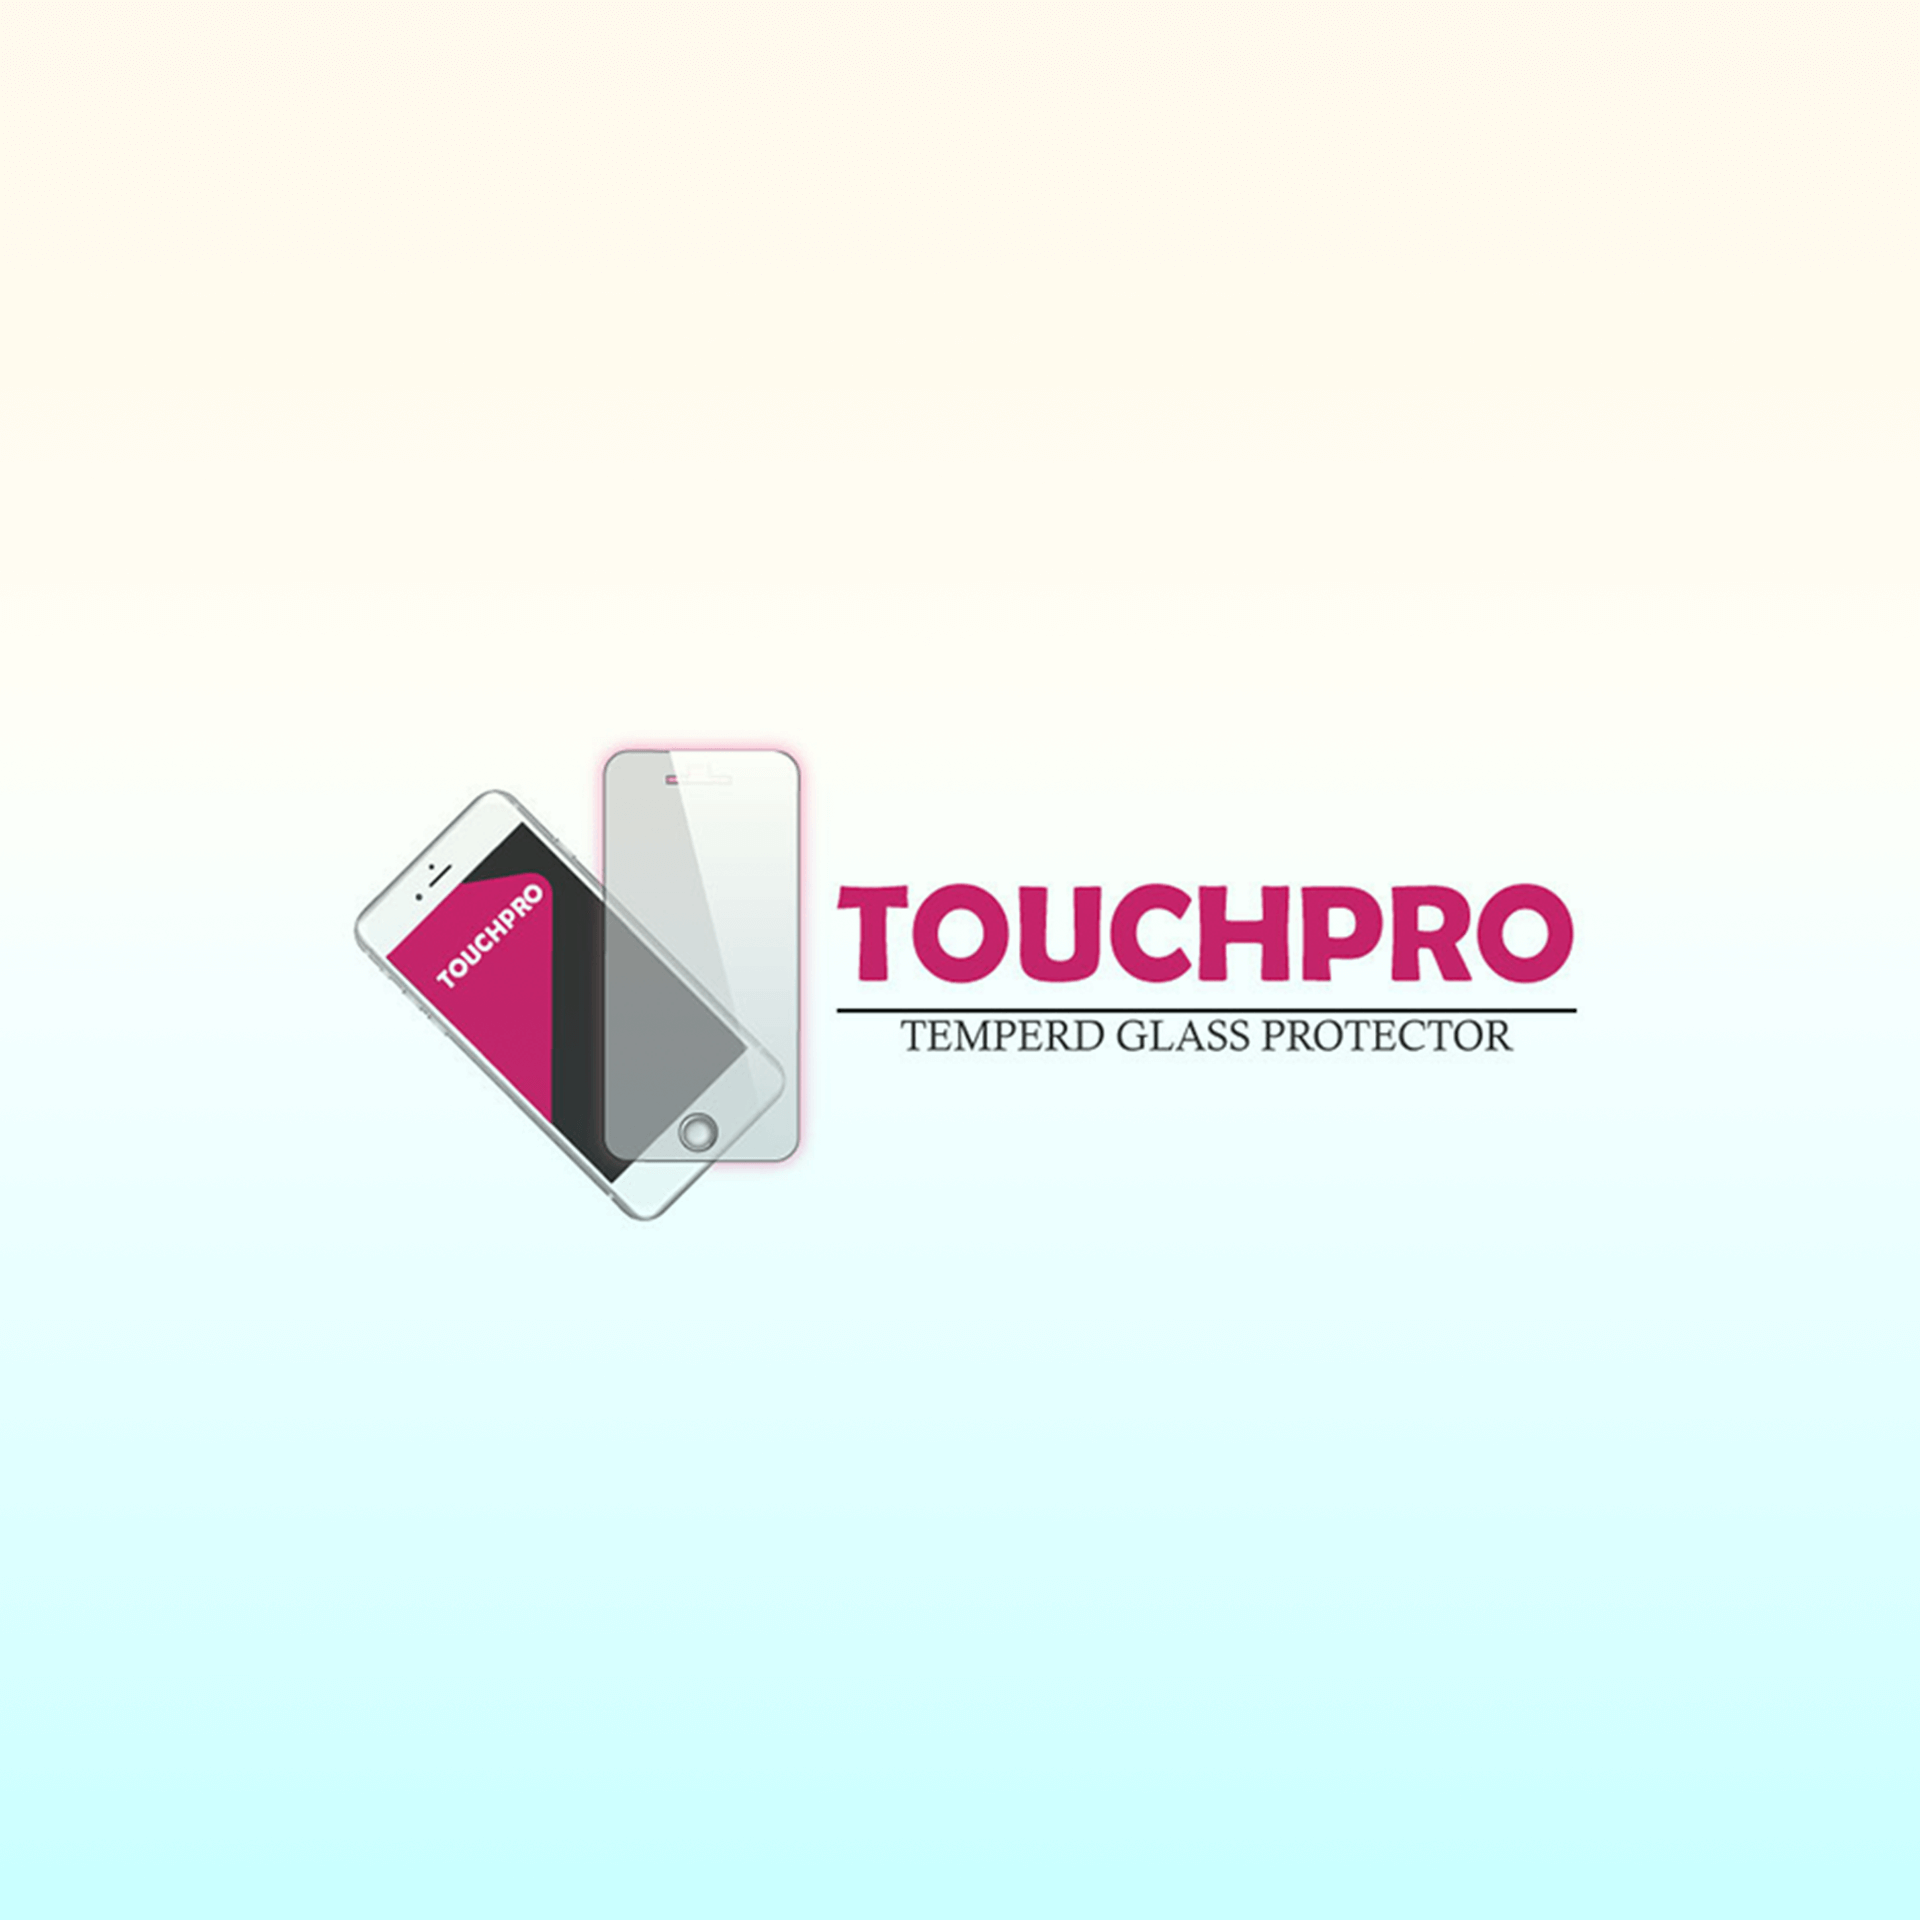 Touchpro